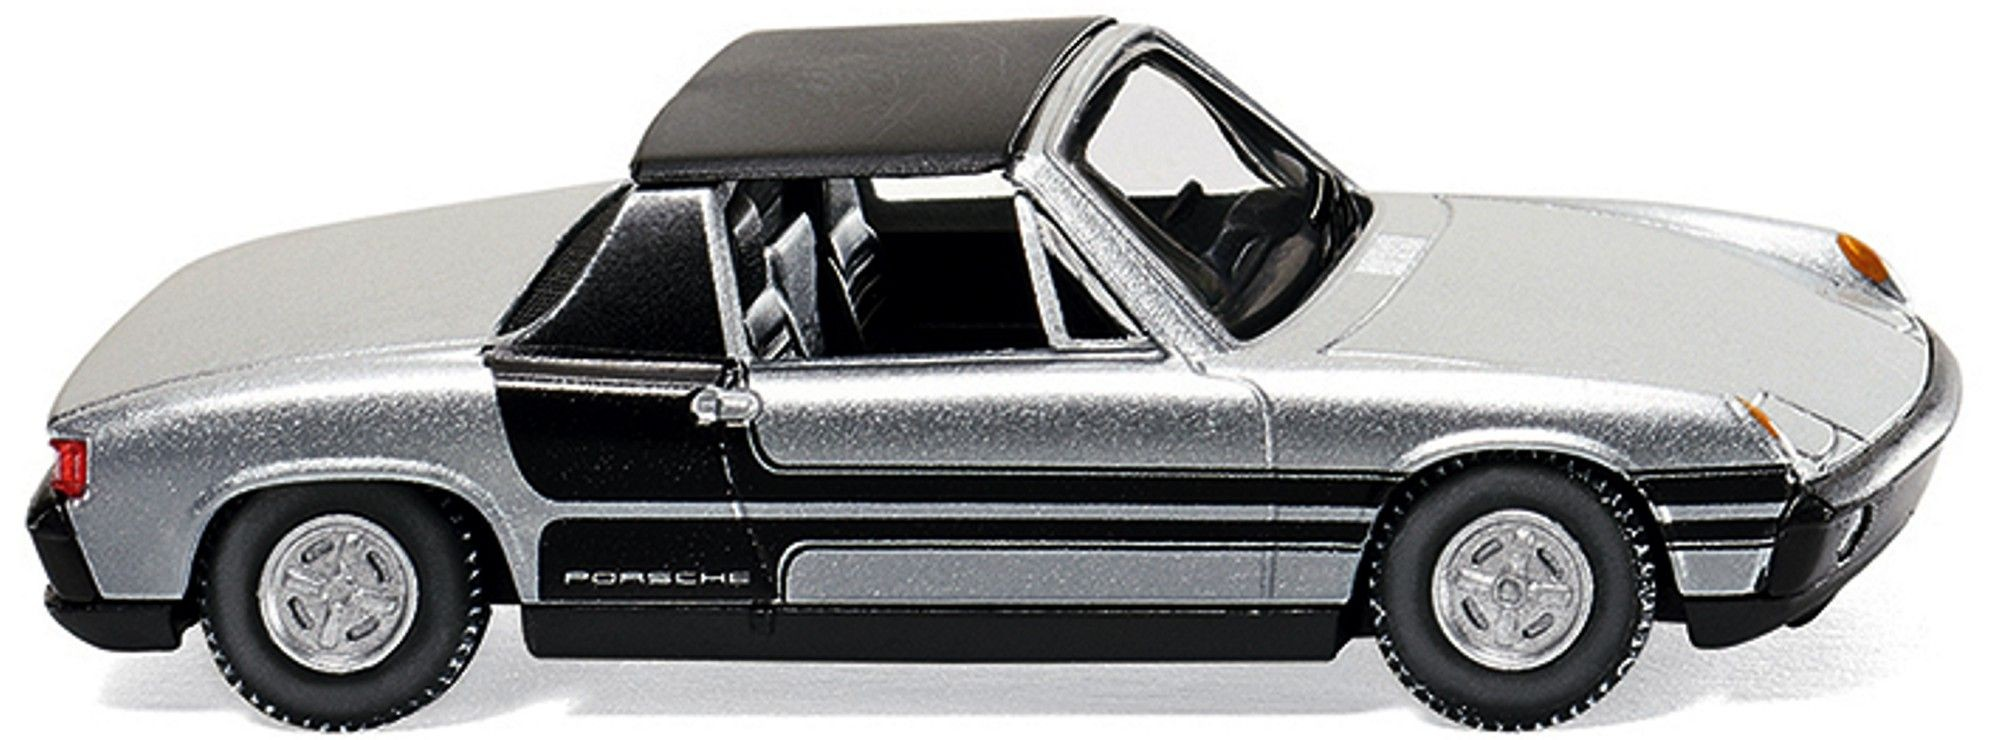 Wiking VW Porsche 914